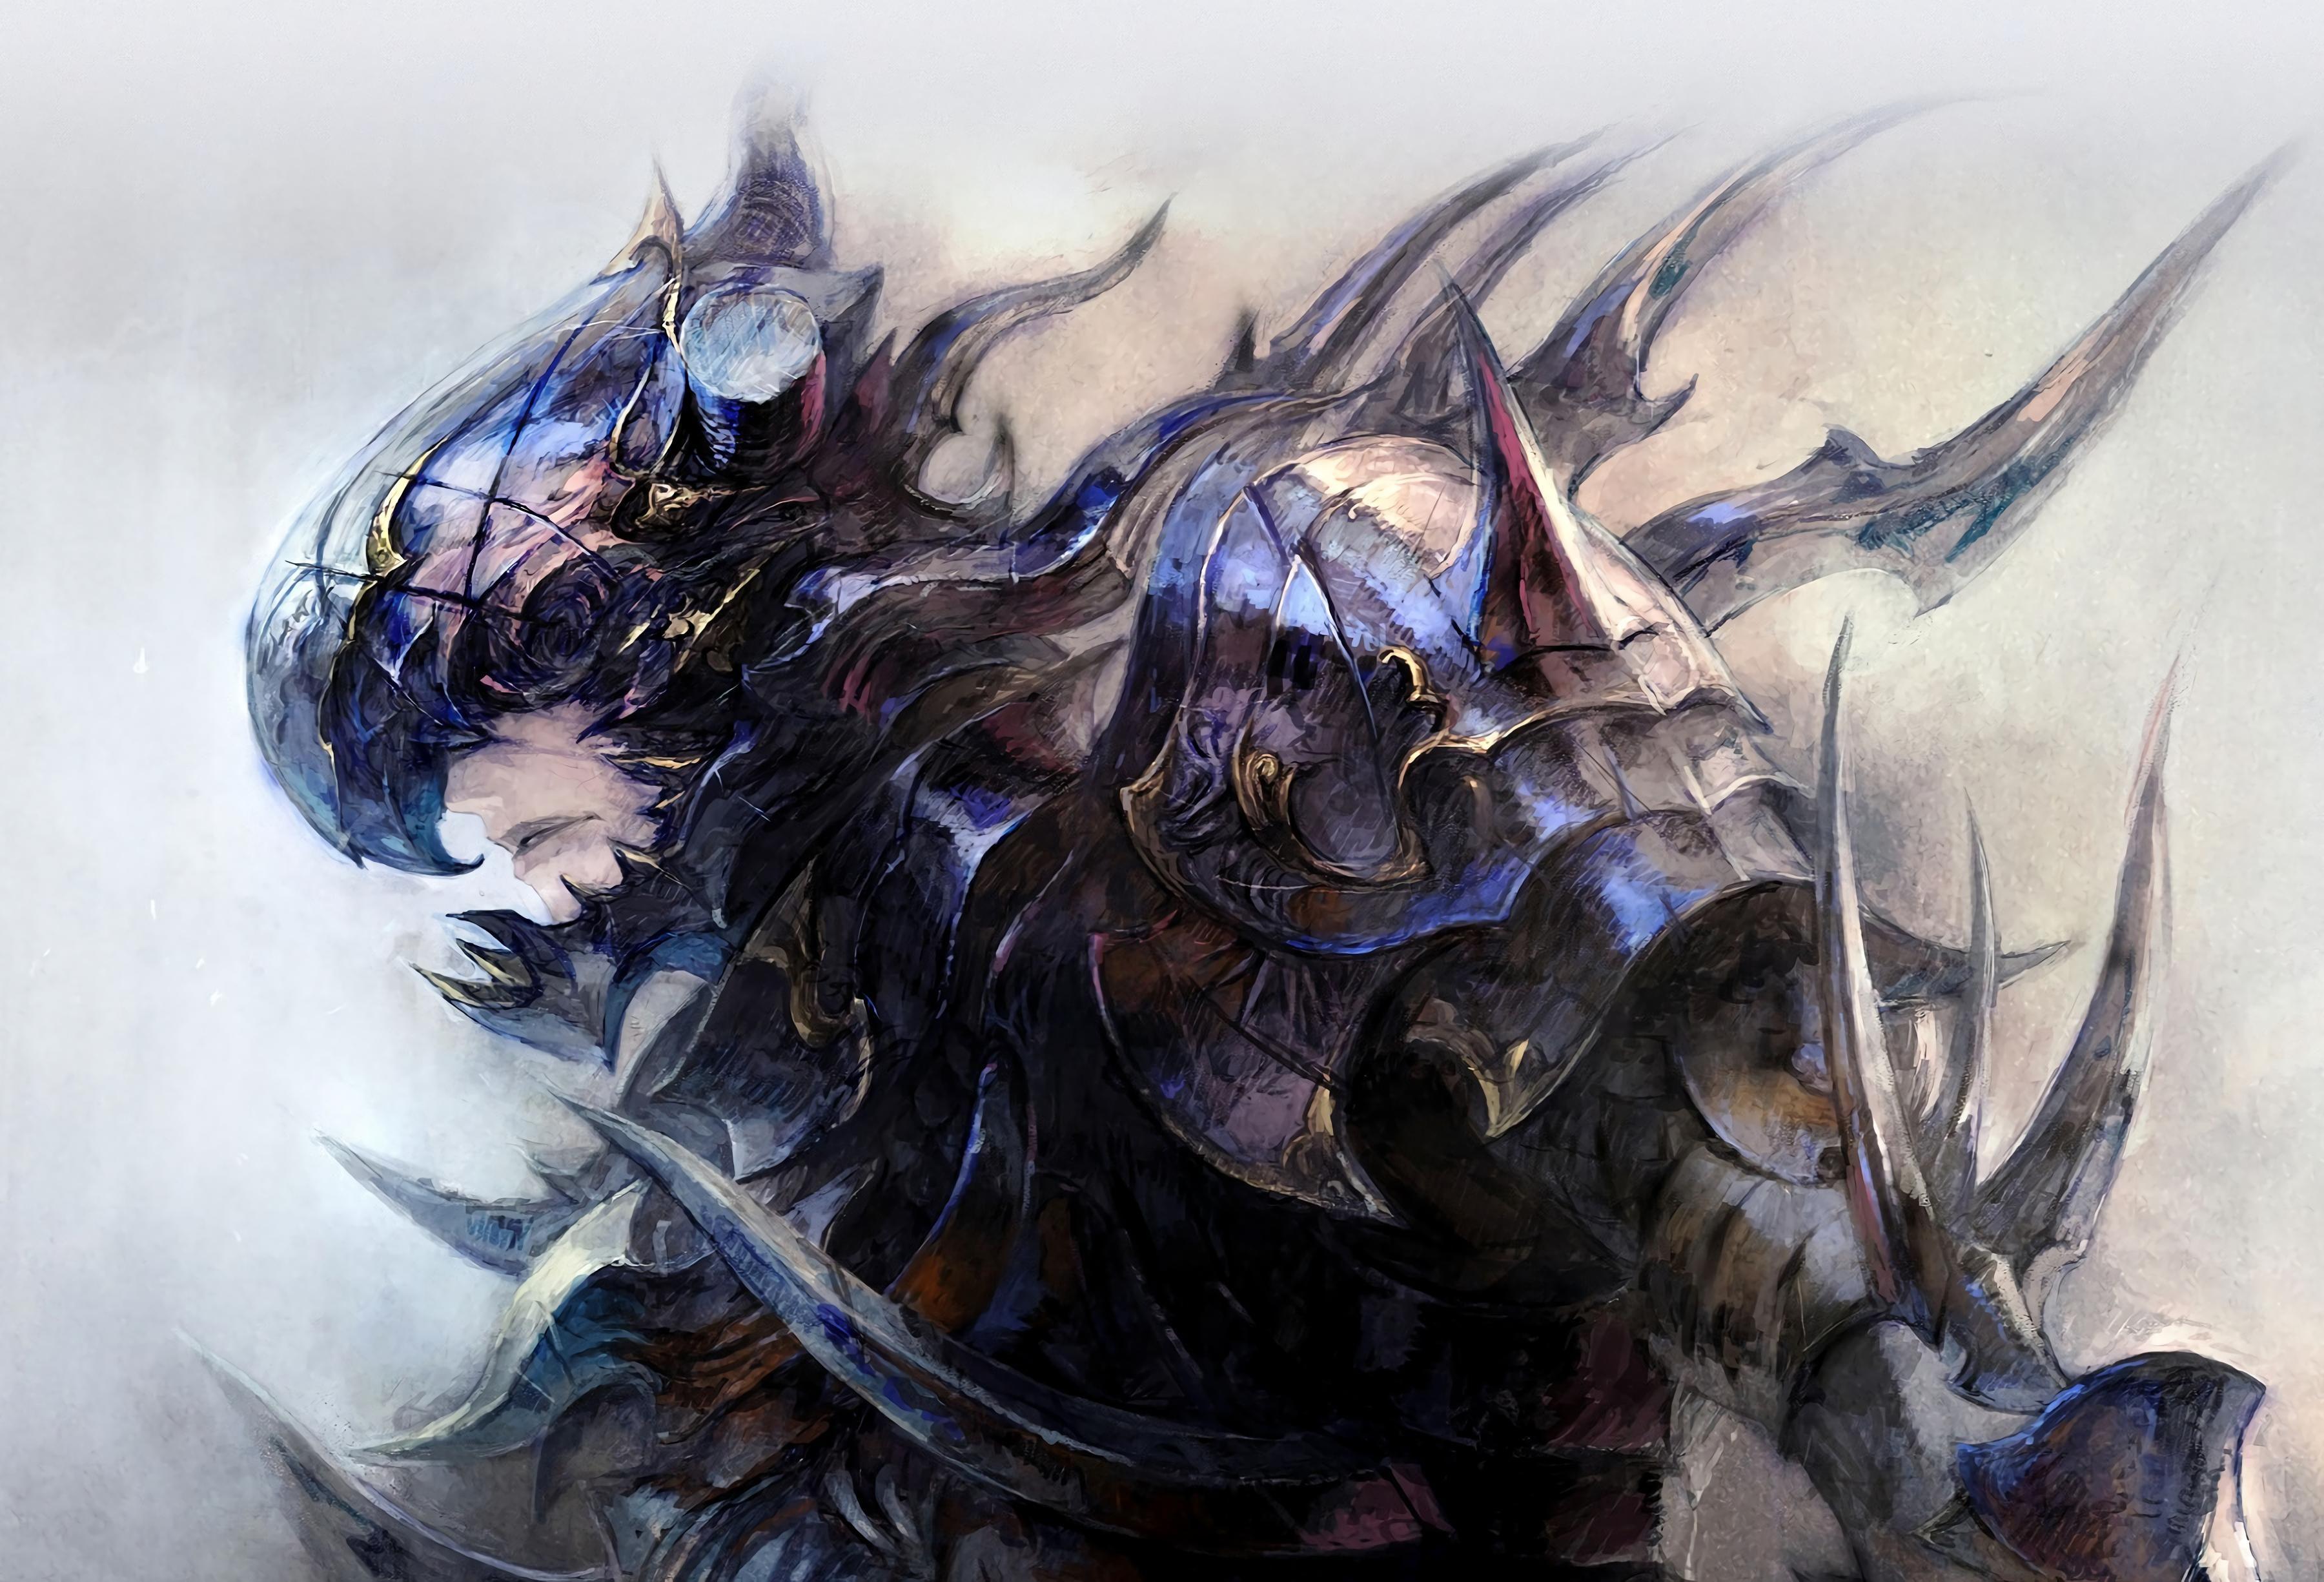 Final Fantasy XIV: Shadowbringers Wallpapers - Wallpaper Cave